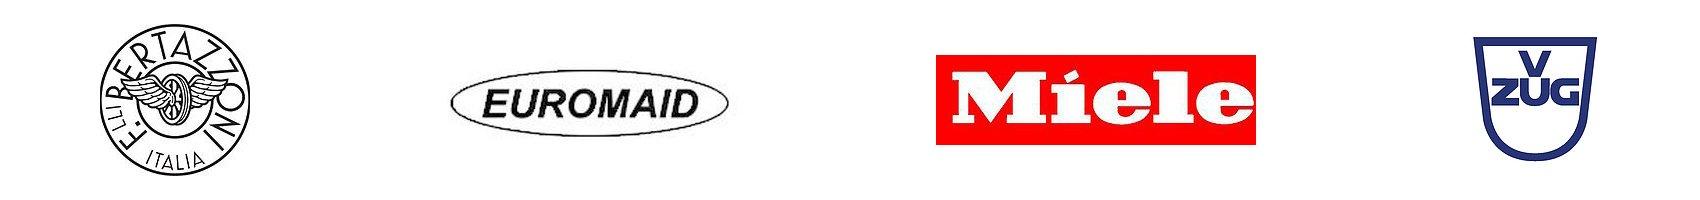 f bertazonna italia euromaid miele zug logos